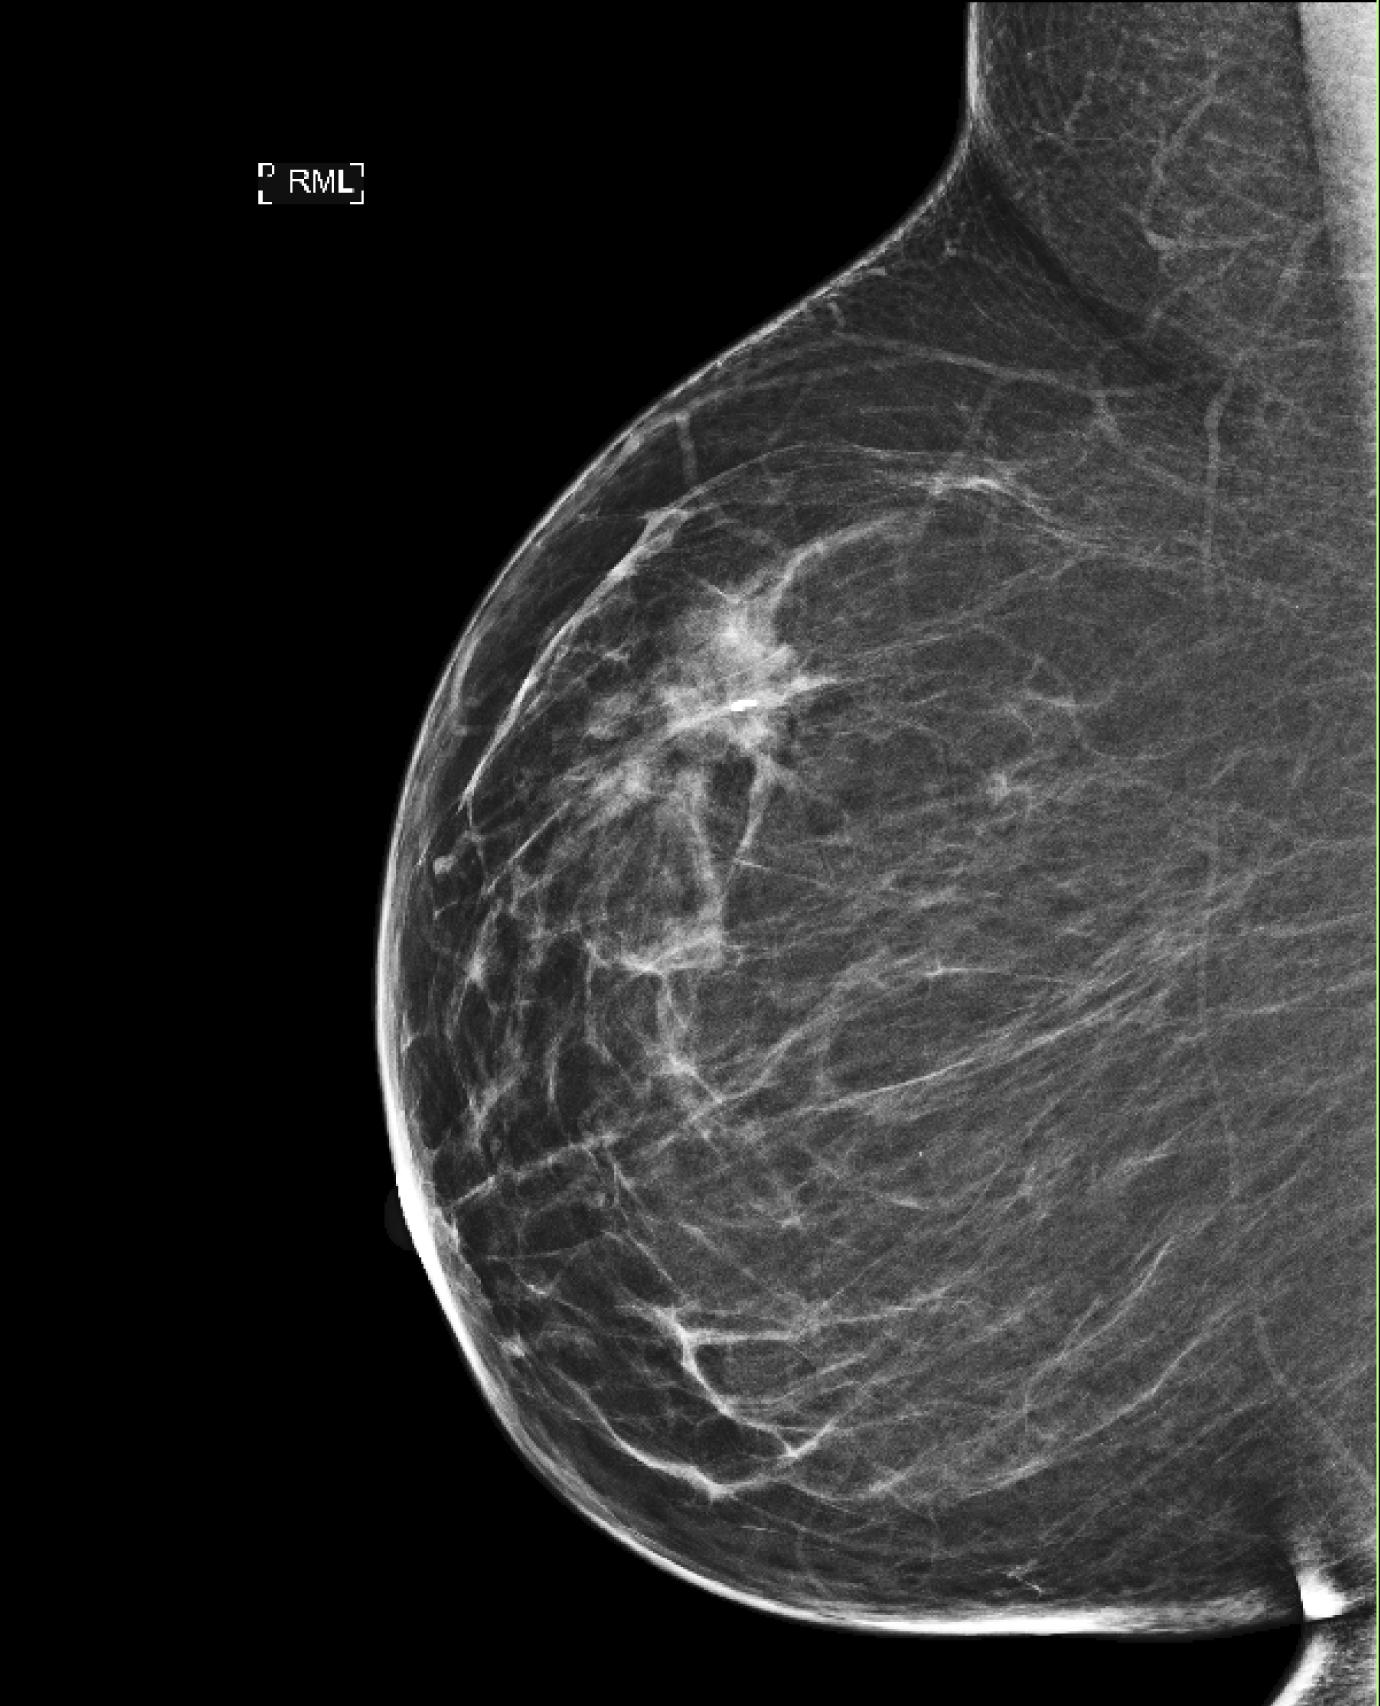 brustkrebs mit 20